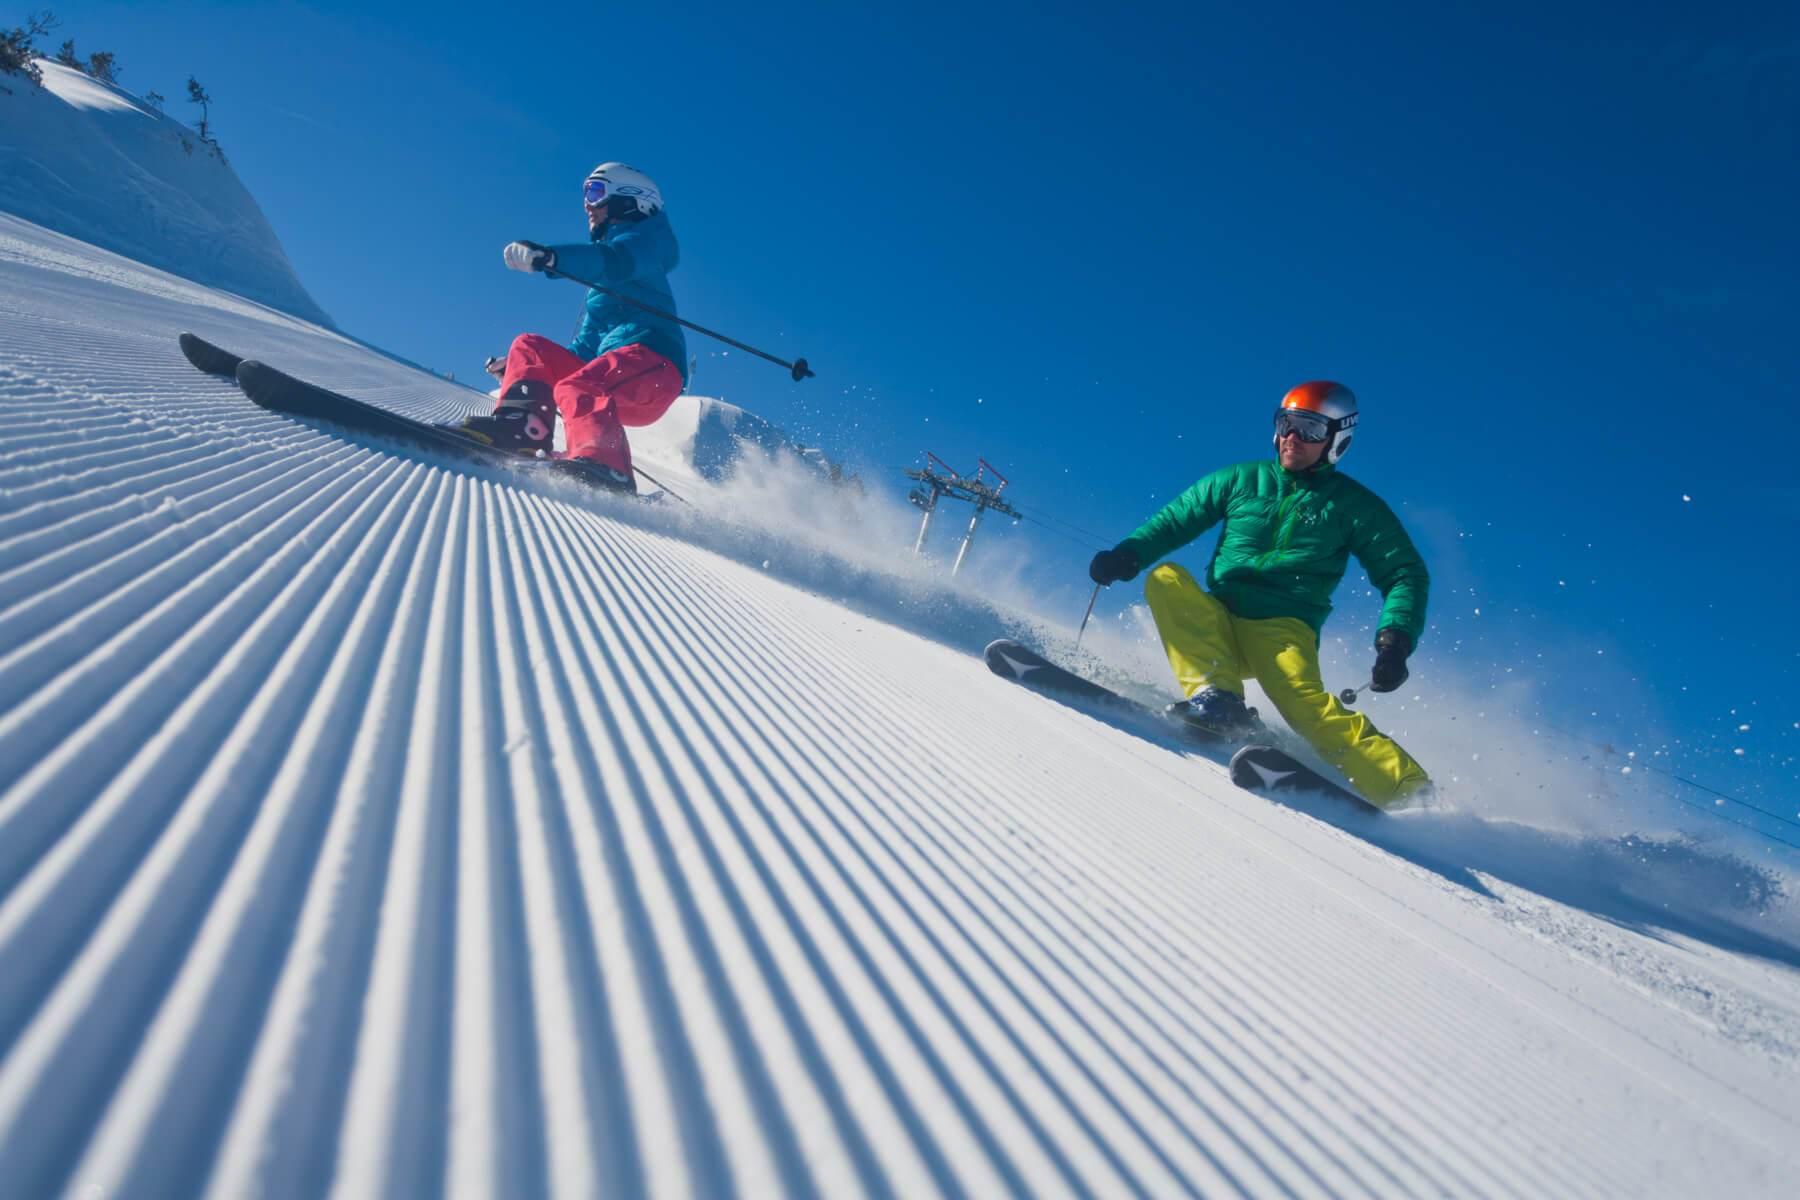 austrian alpine chalets reiteralm ski amade 13 detached and new build design chalets in ski. Black Bedroom Furniture Sets. Home Design Ideas